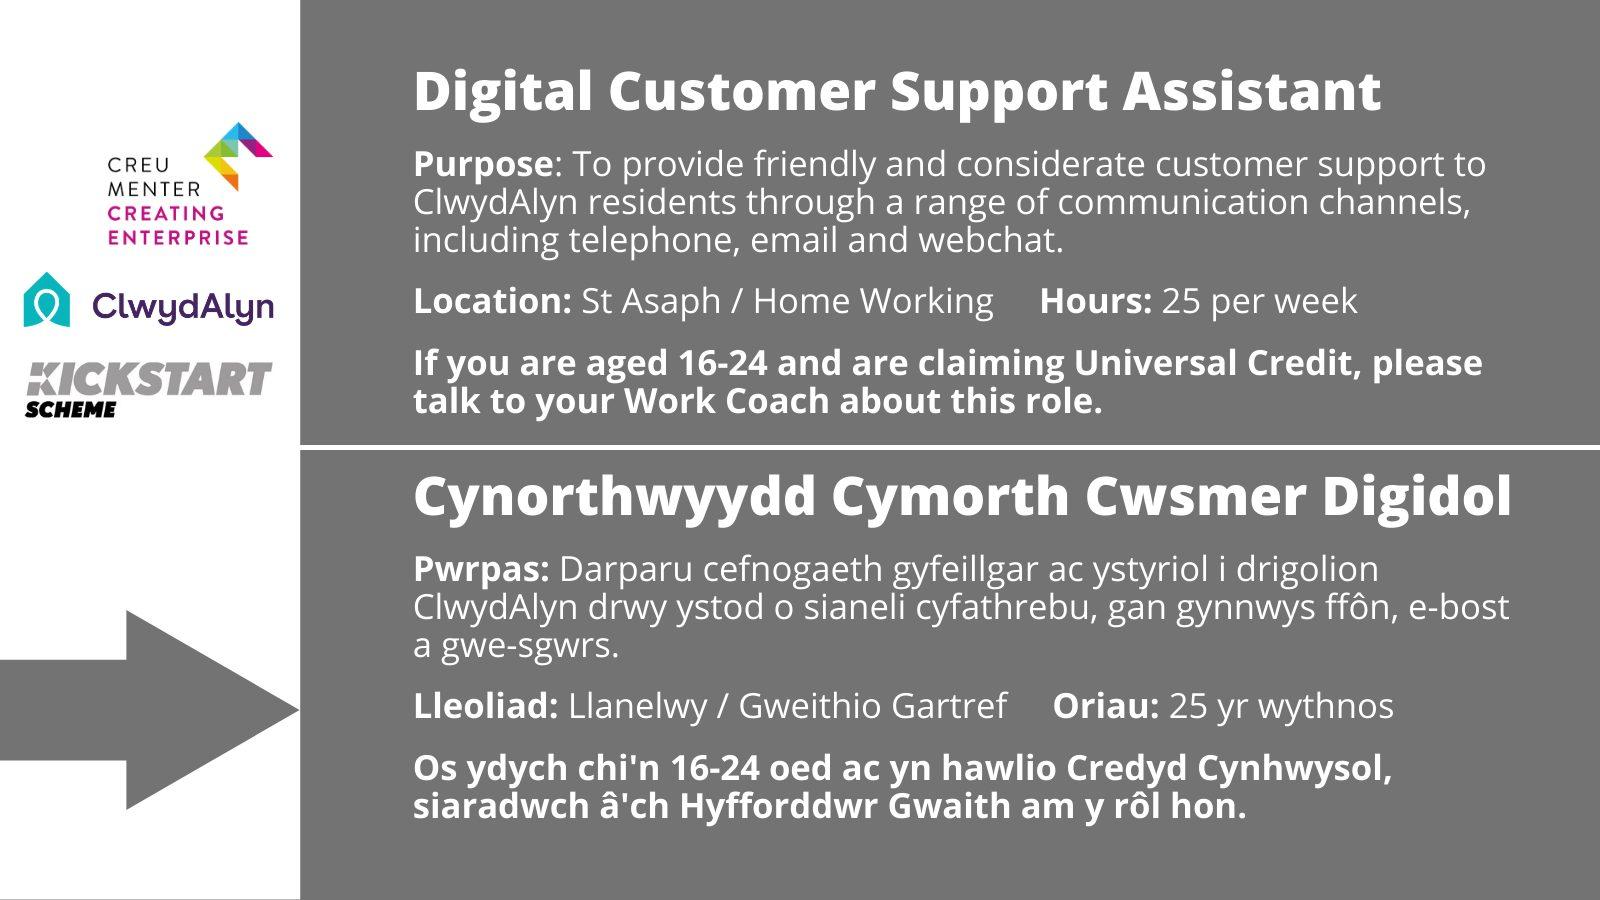 Digital Customer Support Assistant